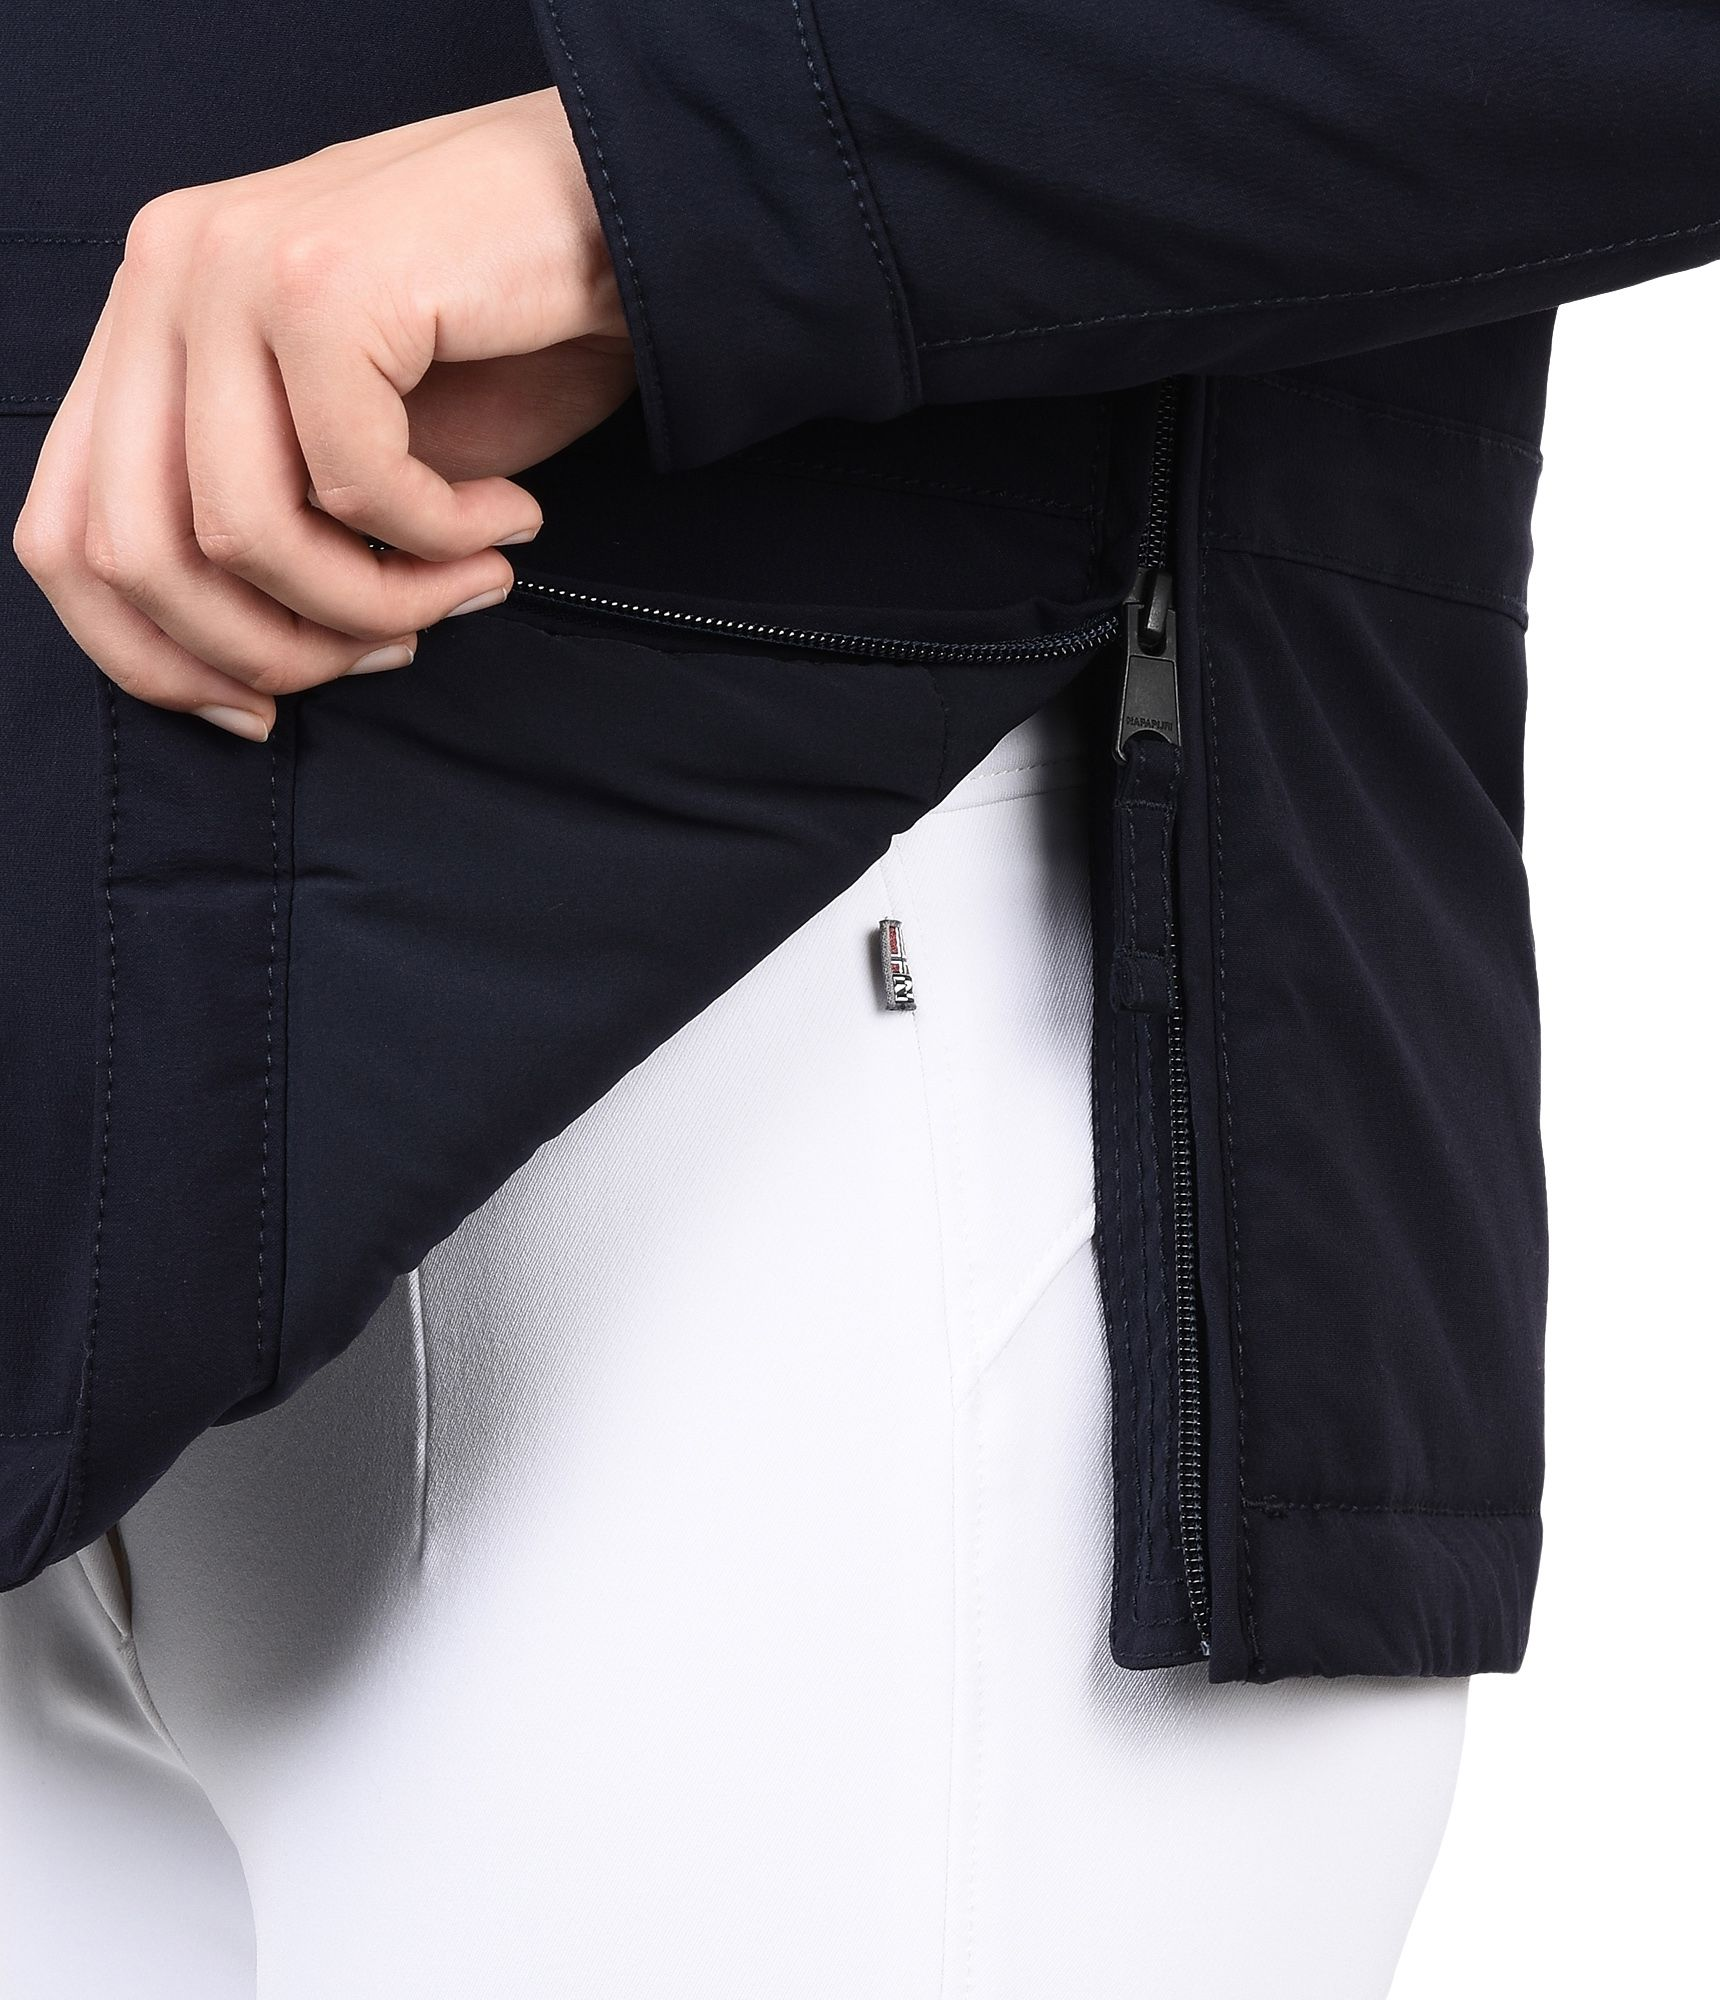 brand new 93348 b4f75 napapijri skidoo skidoo eco fur 1 giacca donna invernale ...